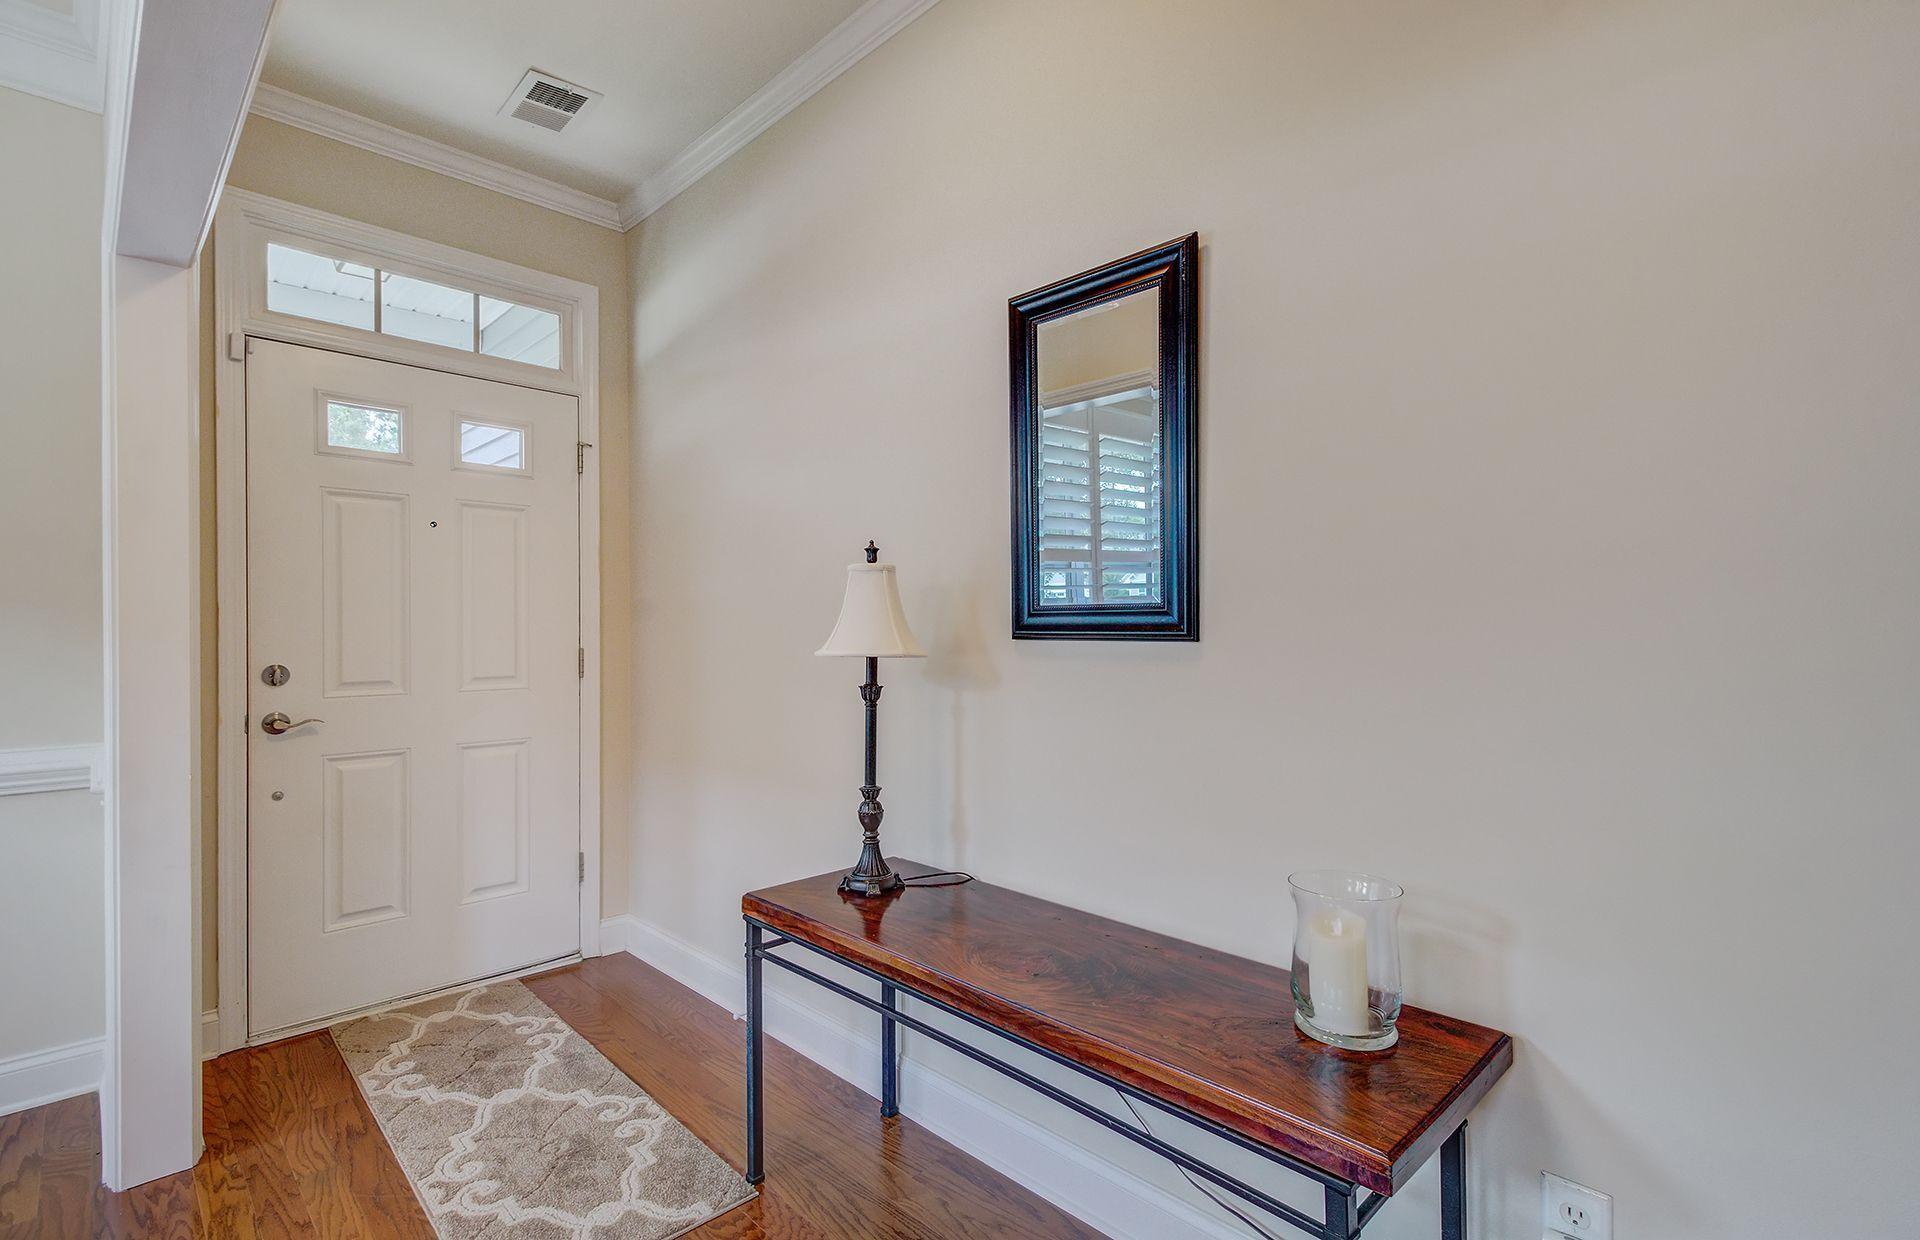 Linnen Place Homes For Sale - 1275 Shingleback, Mount Pleasant, SC - 33